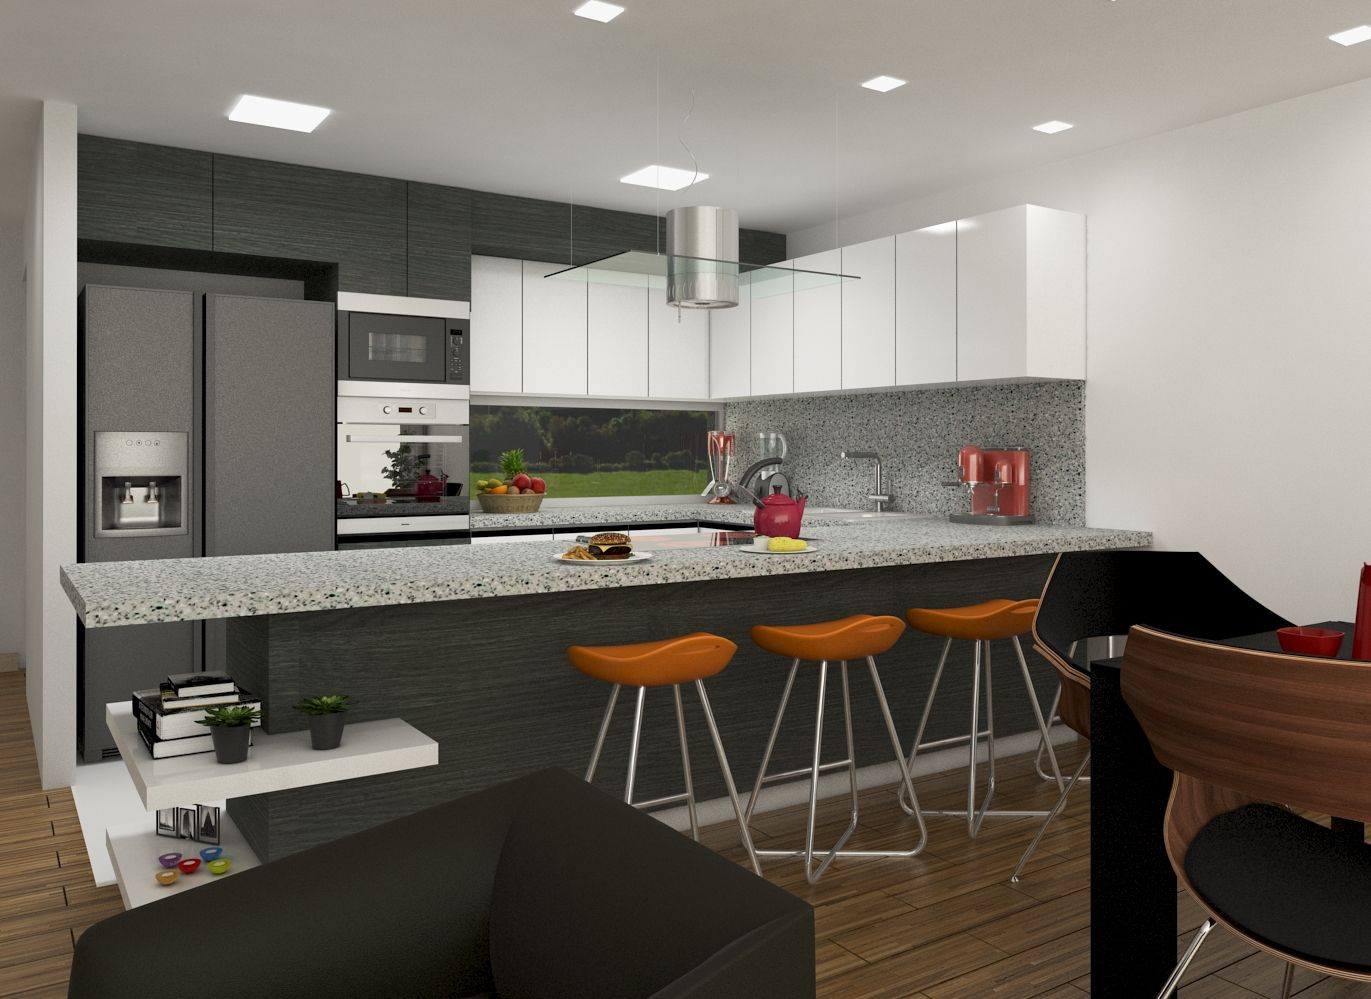 Diseño interior moderno contemporaneo cocina   Diseño Interior ...